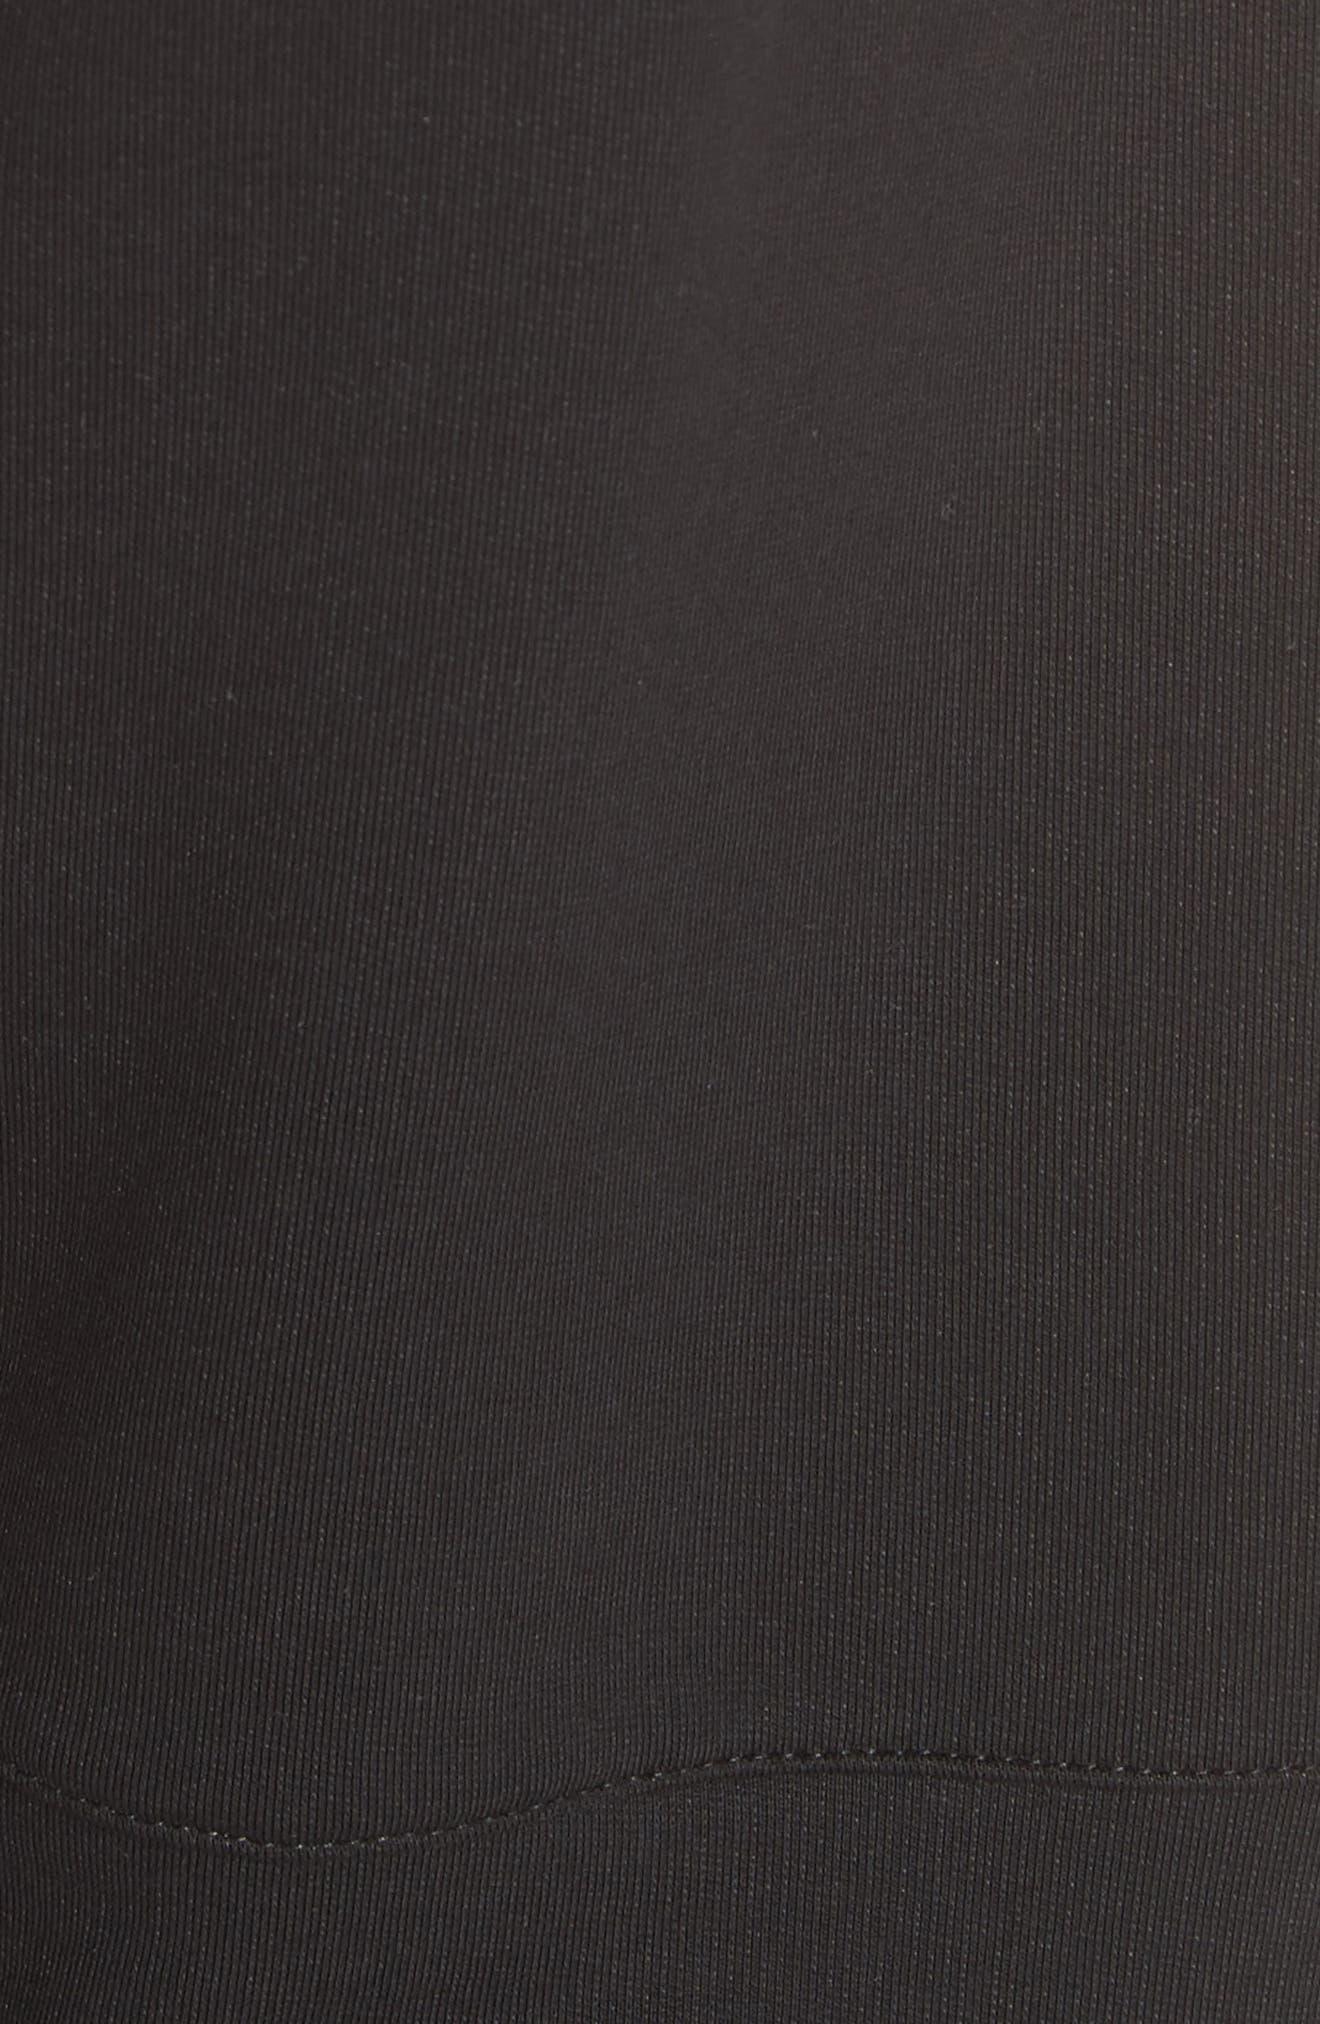 Zip Jogger Pants,                             Alternate thumbnail 5, color,                             Black